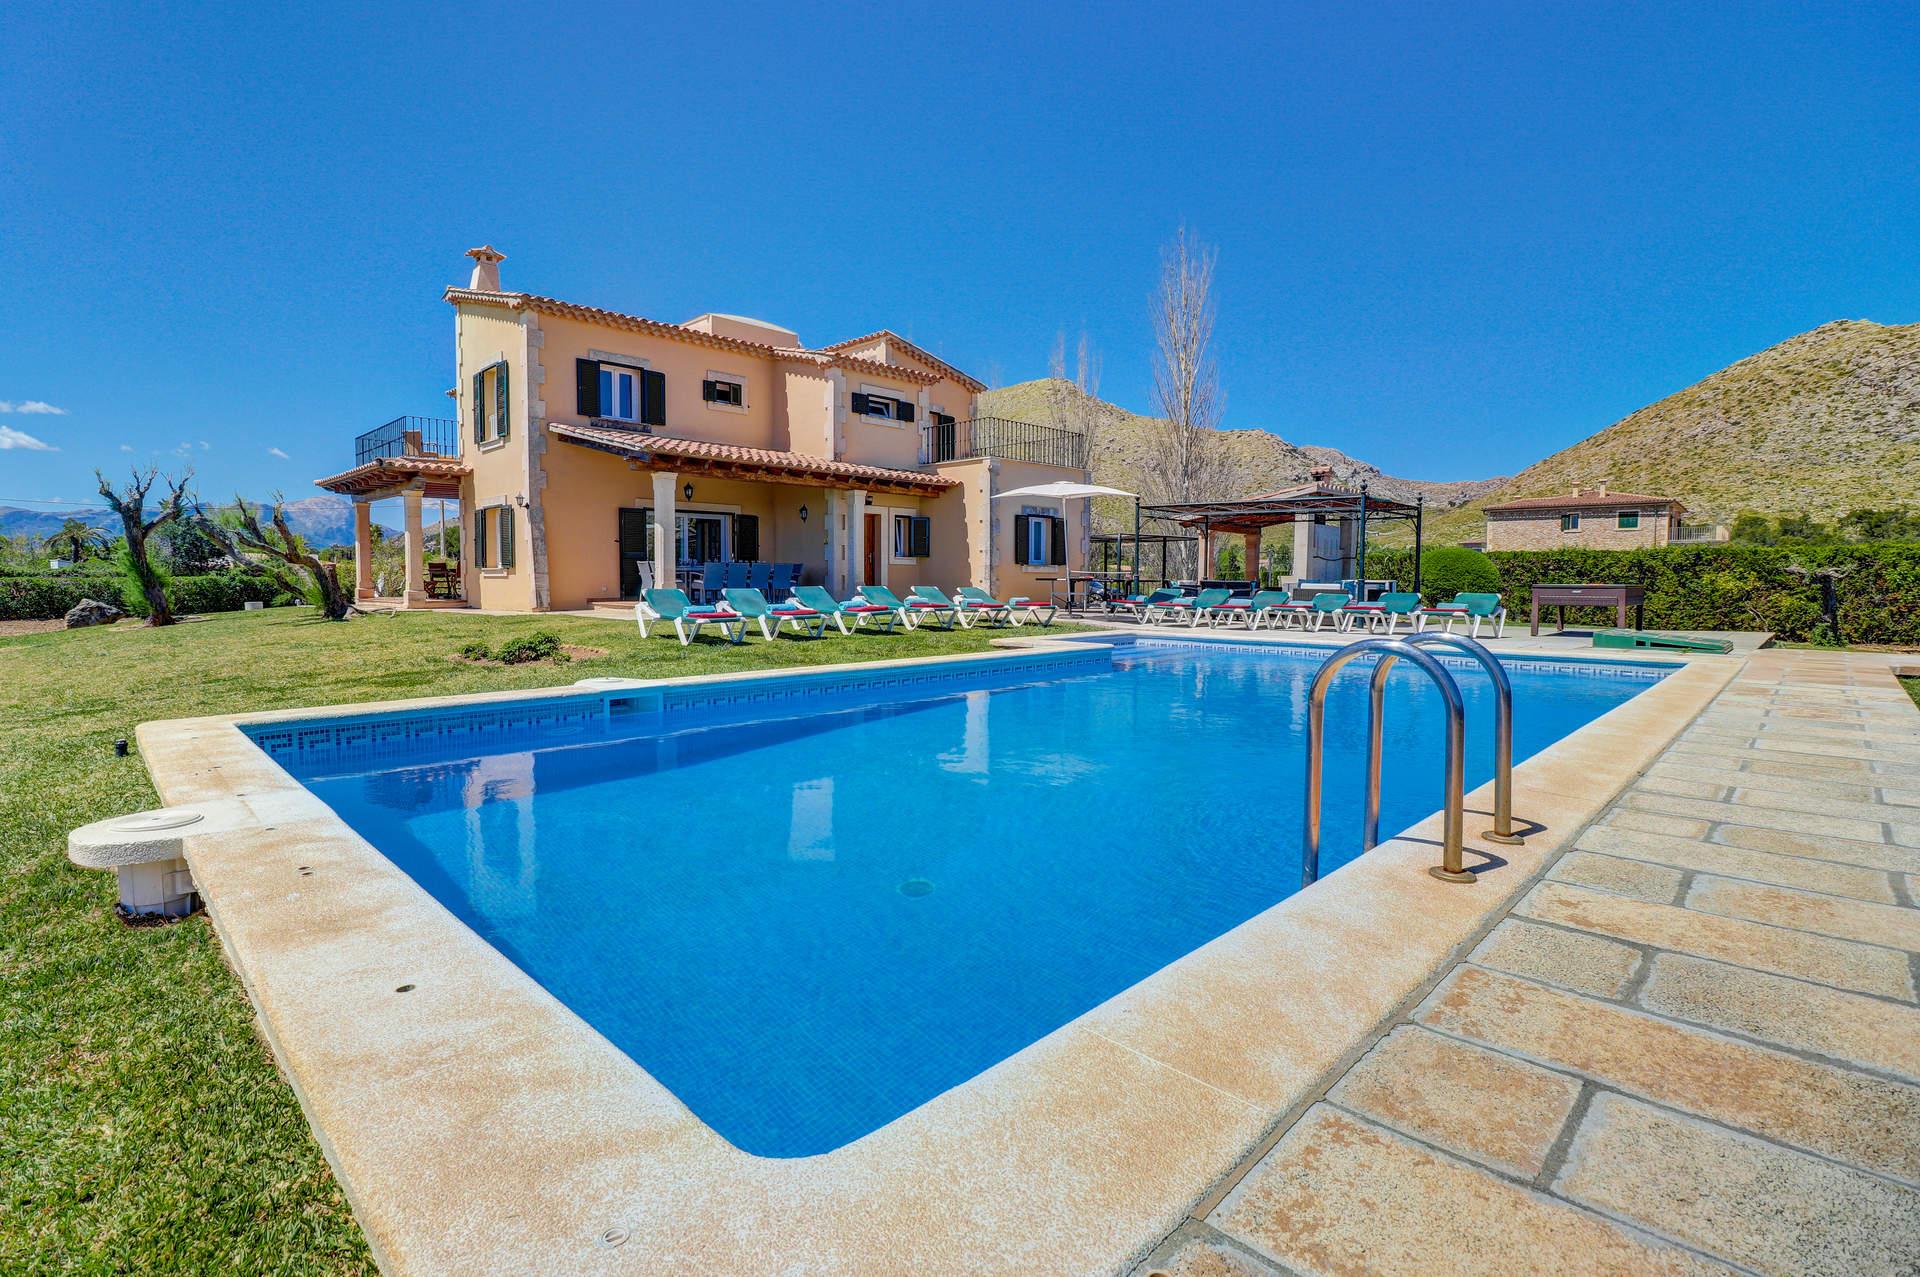 Villa Hort de Siller, Puerto Pollensa, Majorca, Spain